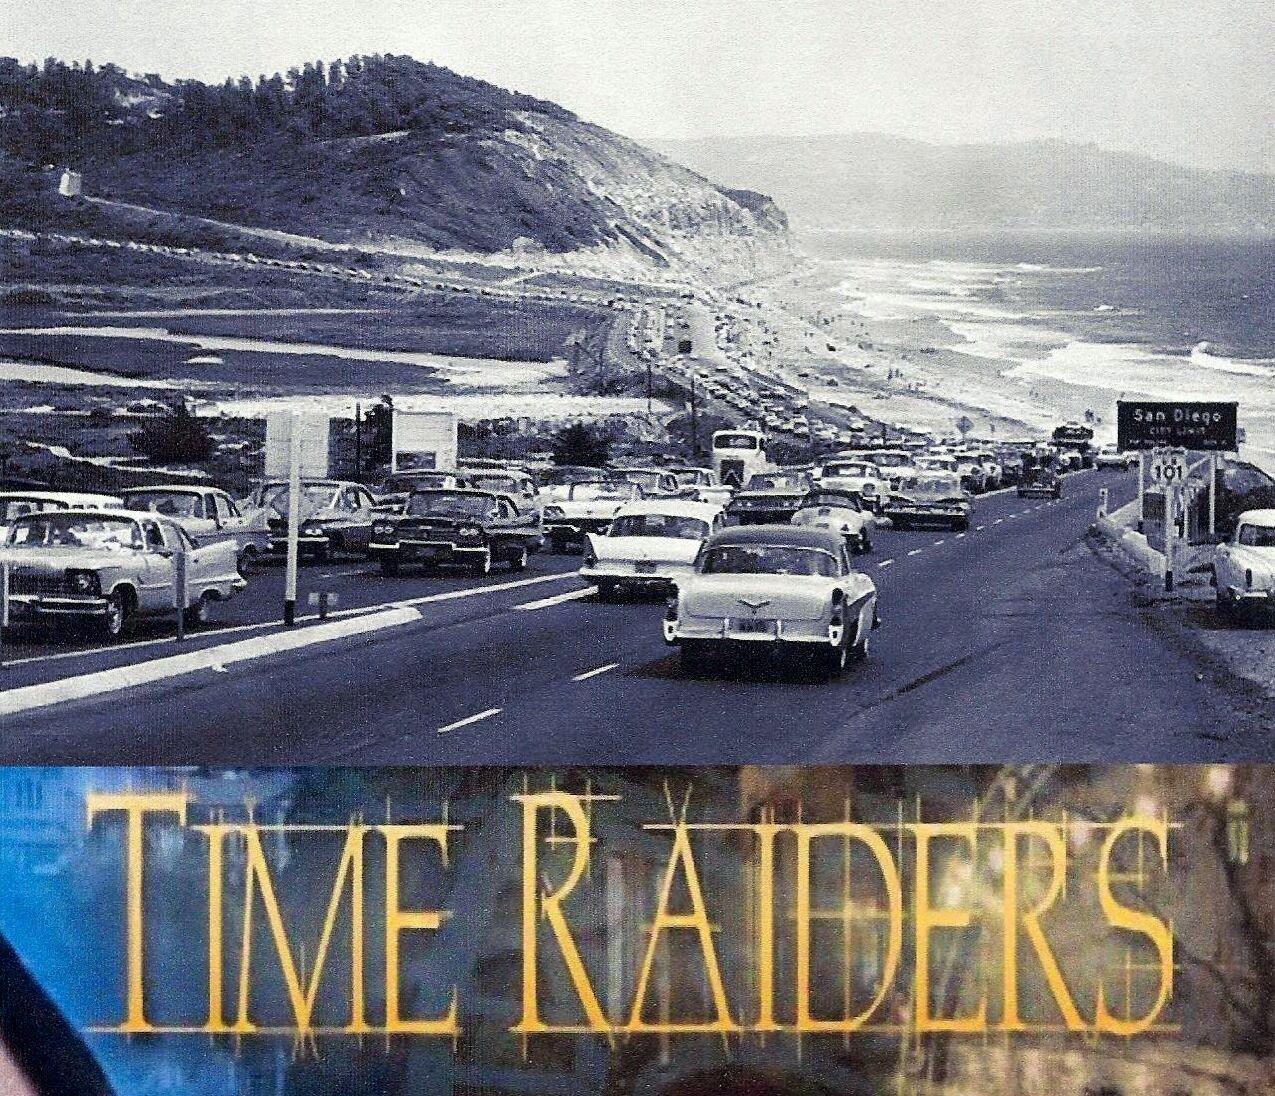 SD*Time*Raiders